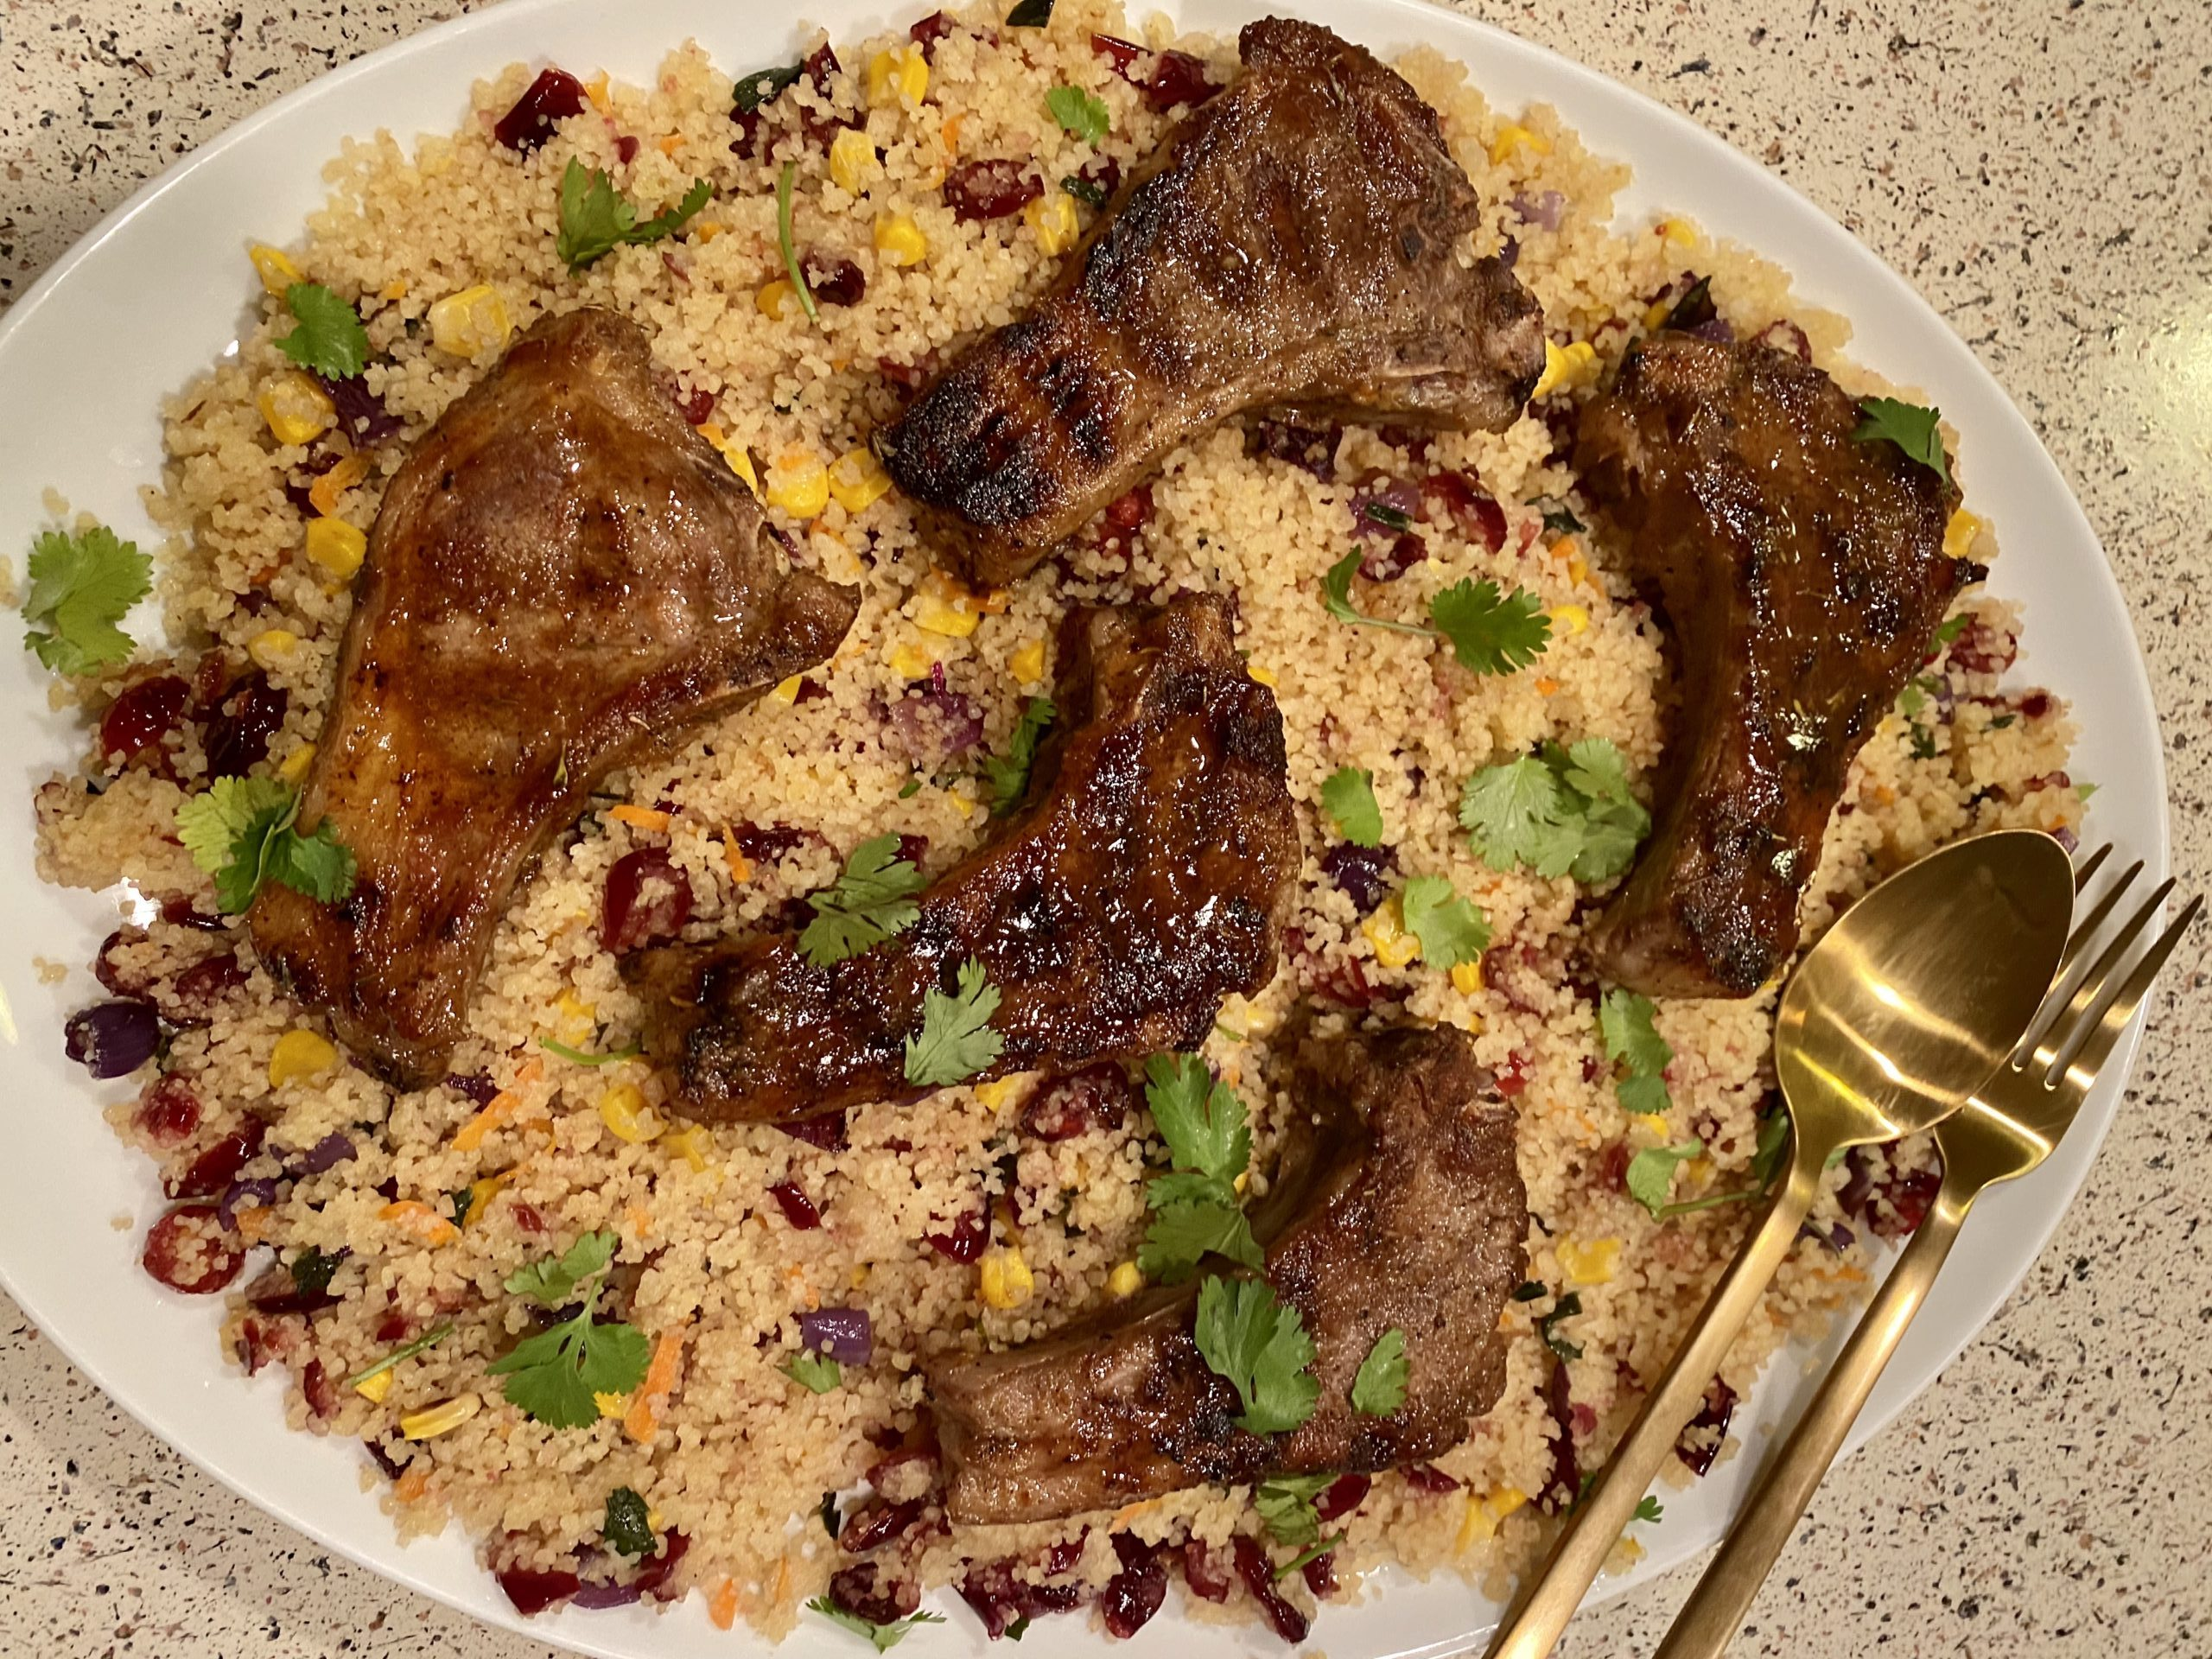 lamb chops and couscous